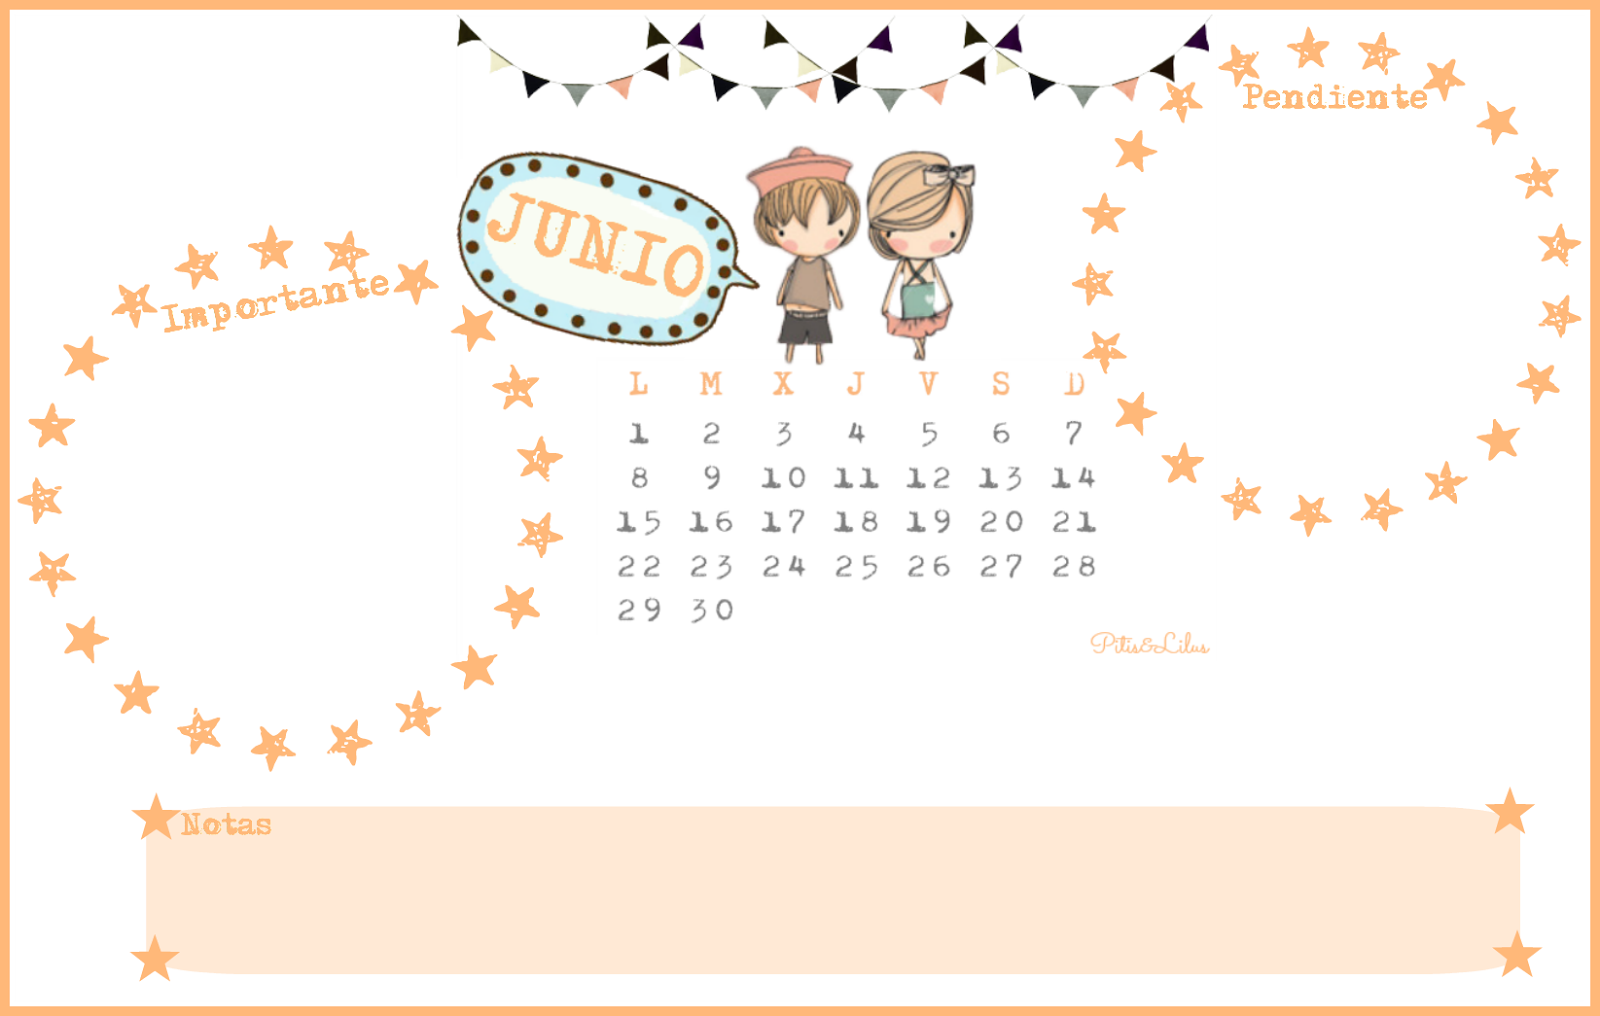 Pitis and lilus calendario imprimible y fondo pantalla for Fondo de pantalla calendario 2018